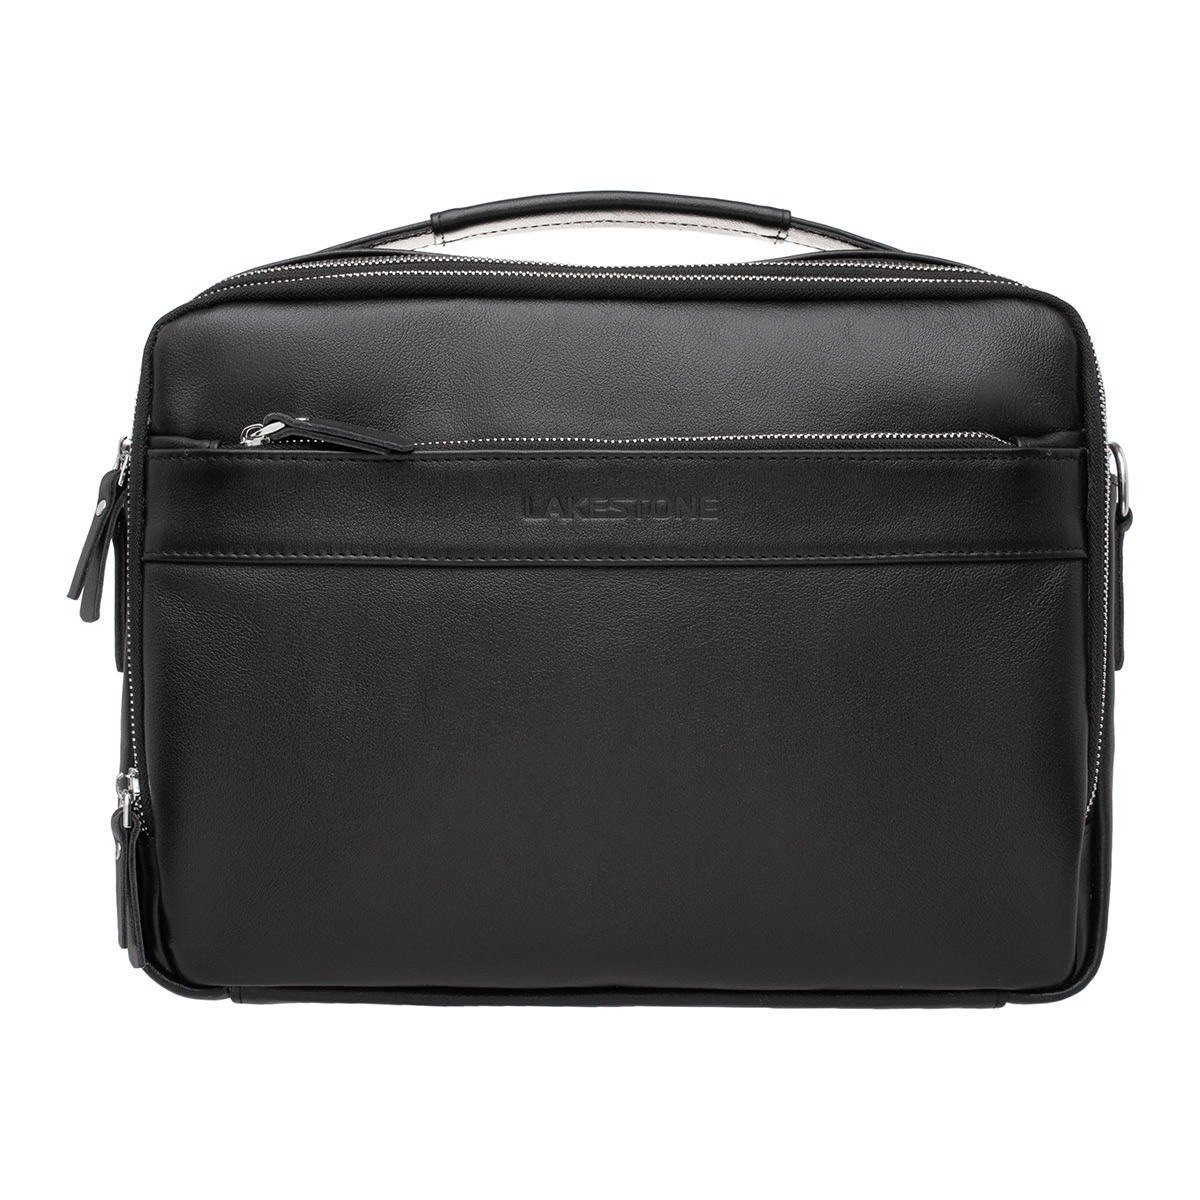 Кожаная мужская сумка Anhor Black фото